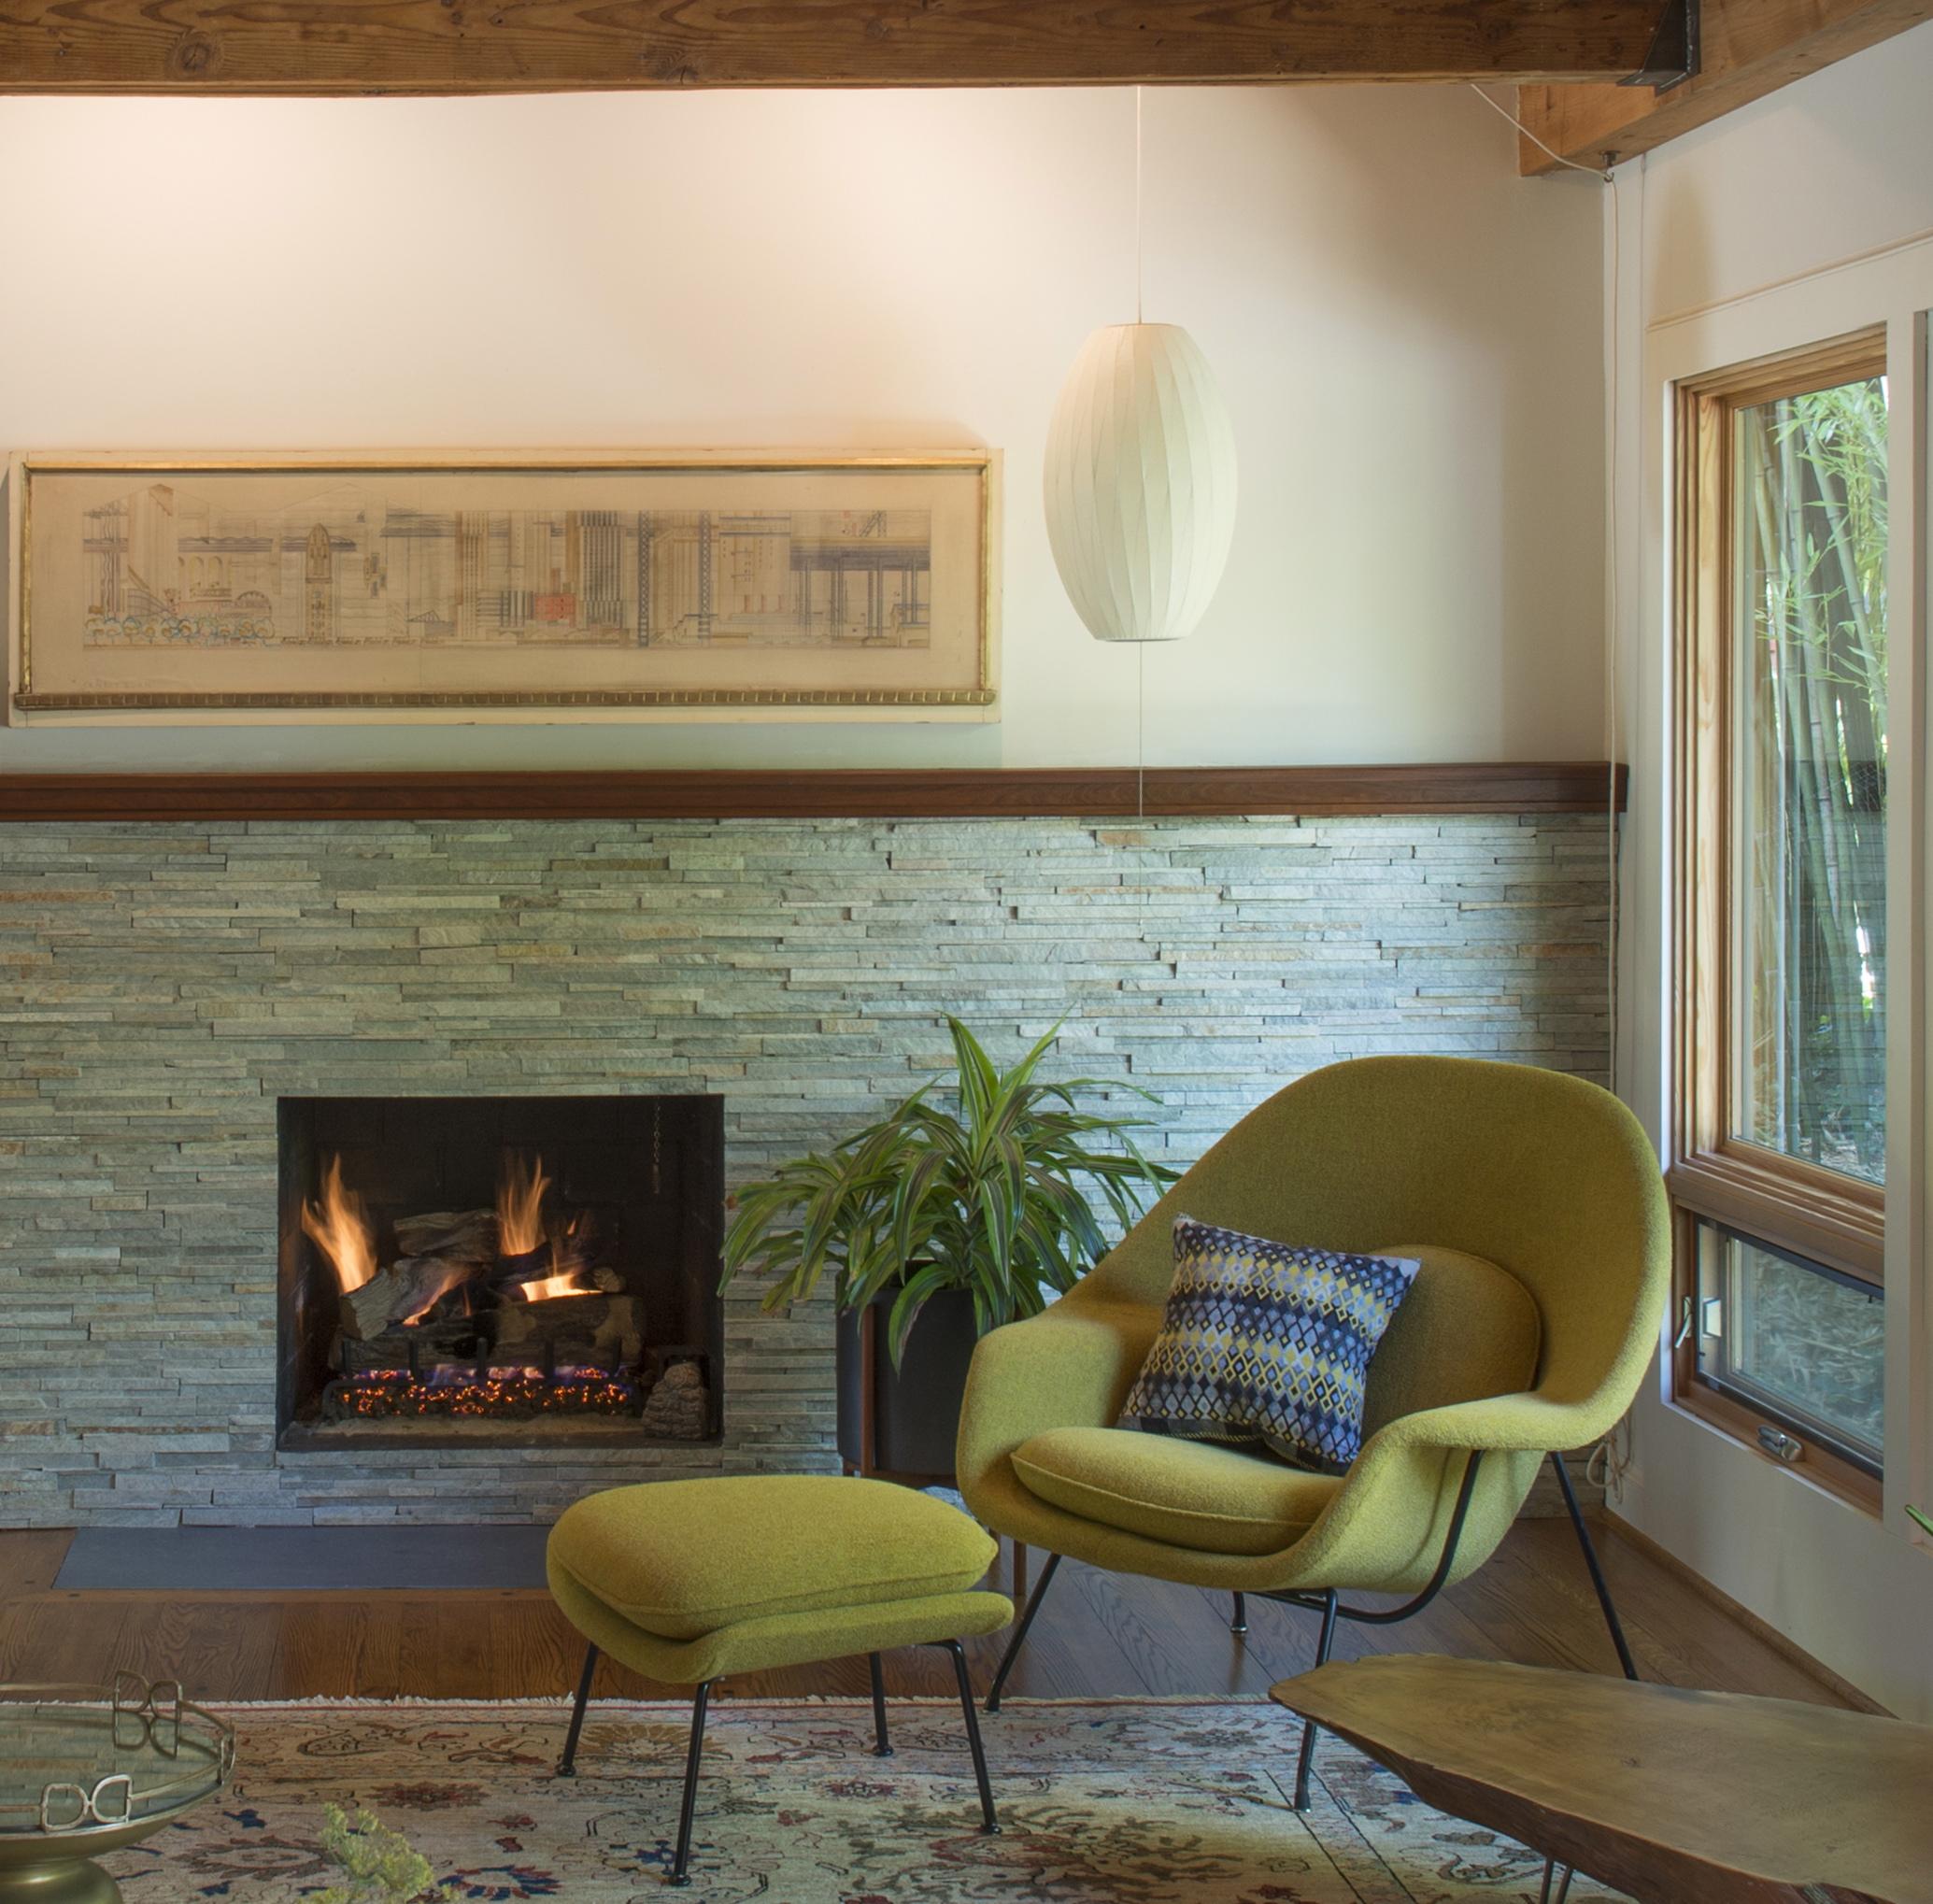 Living Room Fireplace.jpg